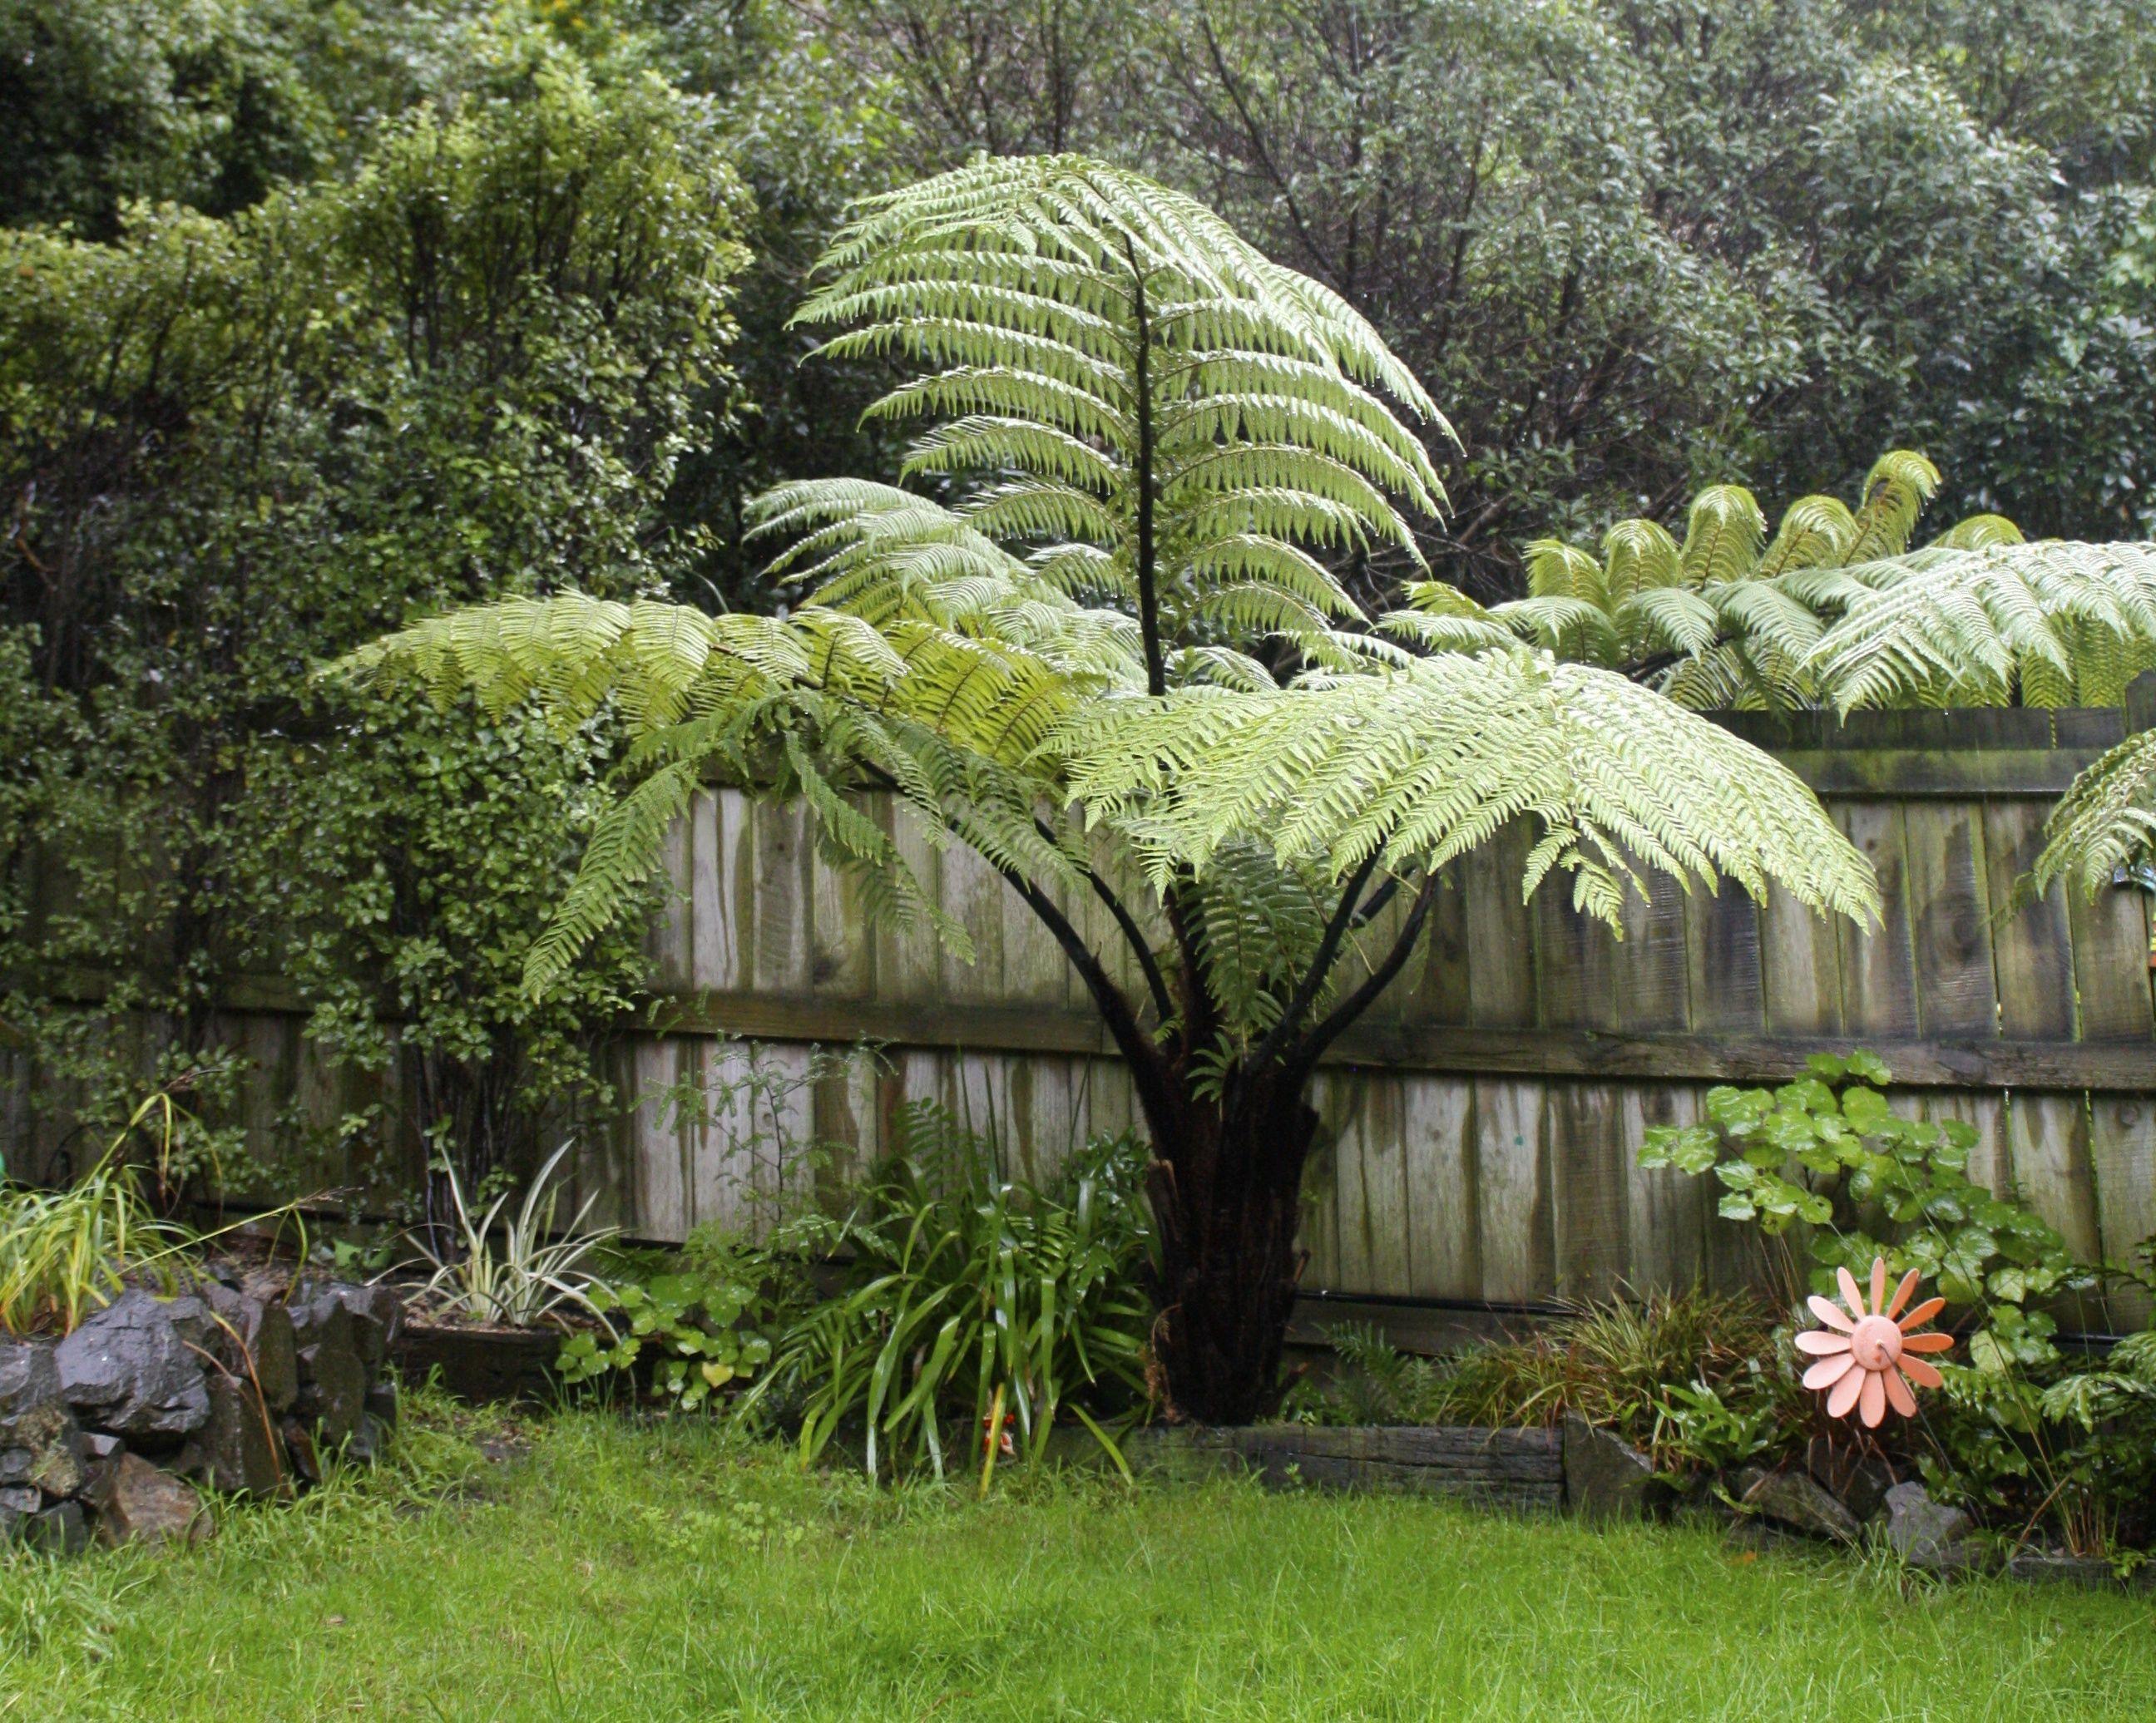 Punga fern in the garden, New Zealand Beautiful gardens